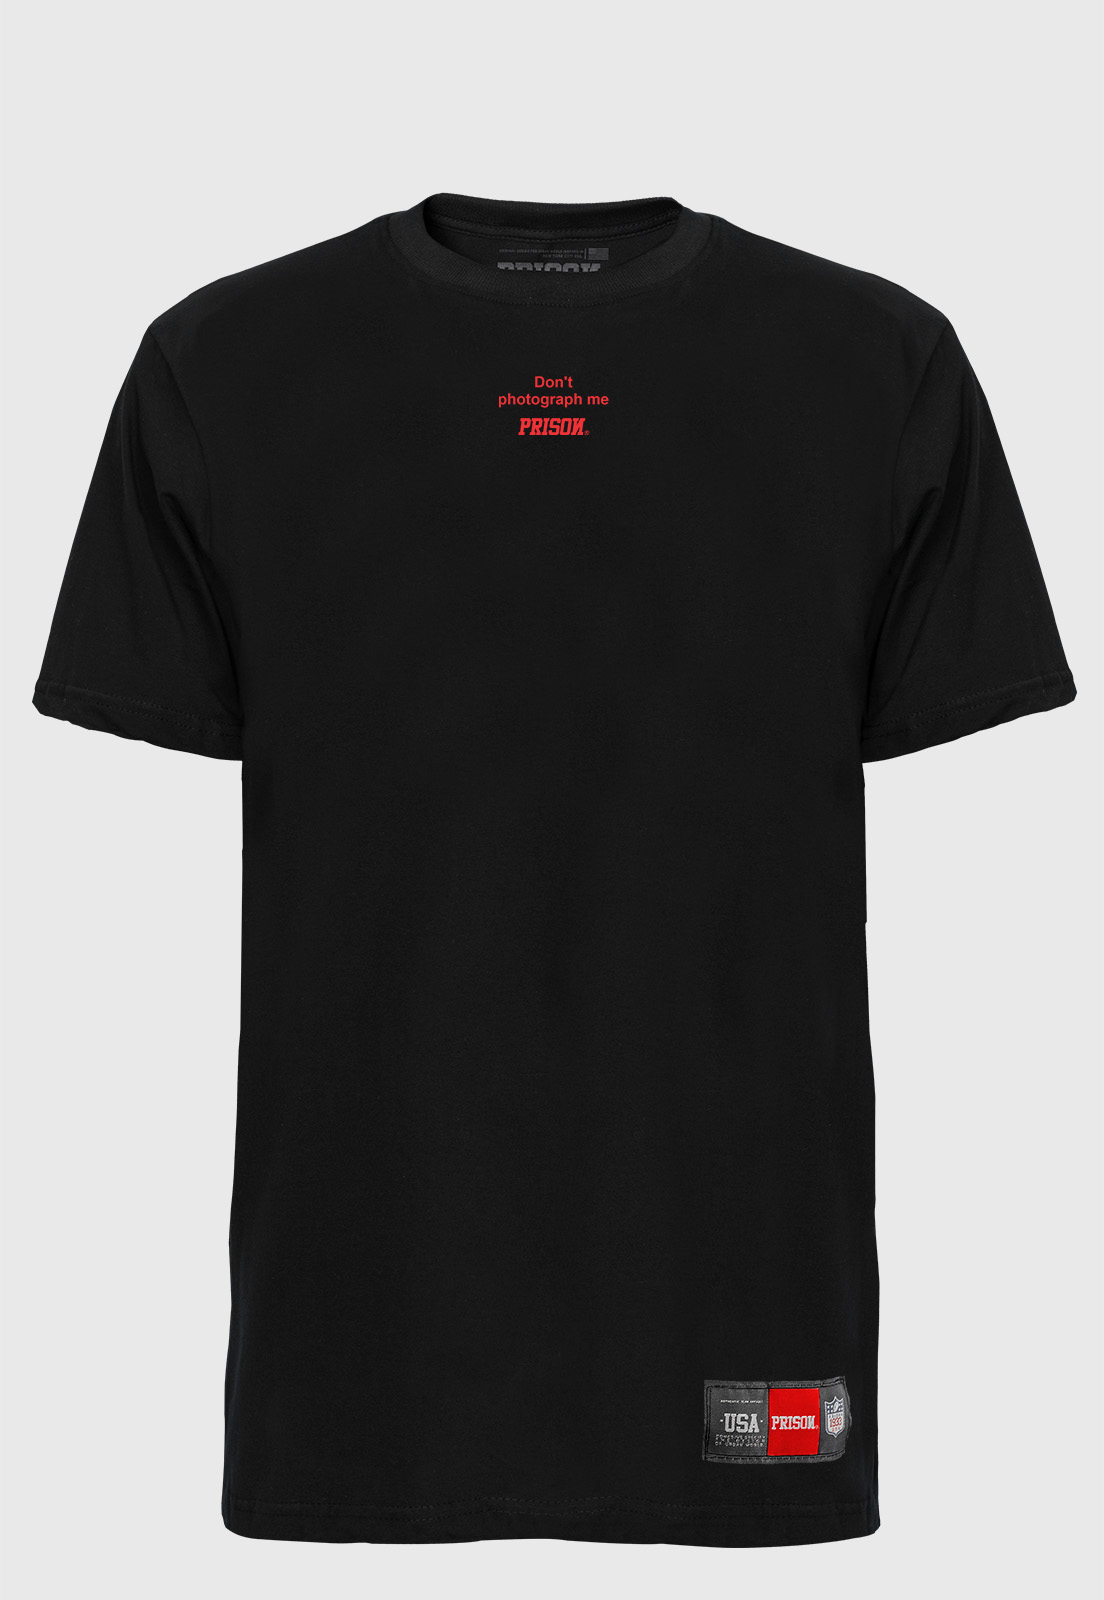 Camiseta Streetwear Prison Don´t Photograph Me Black